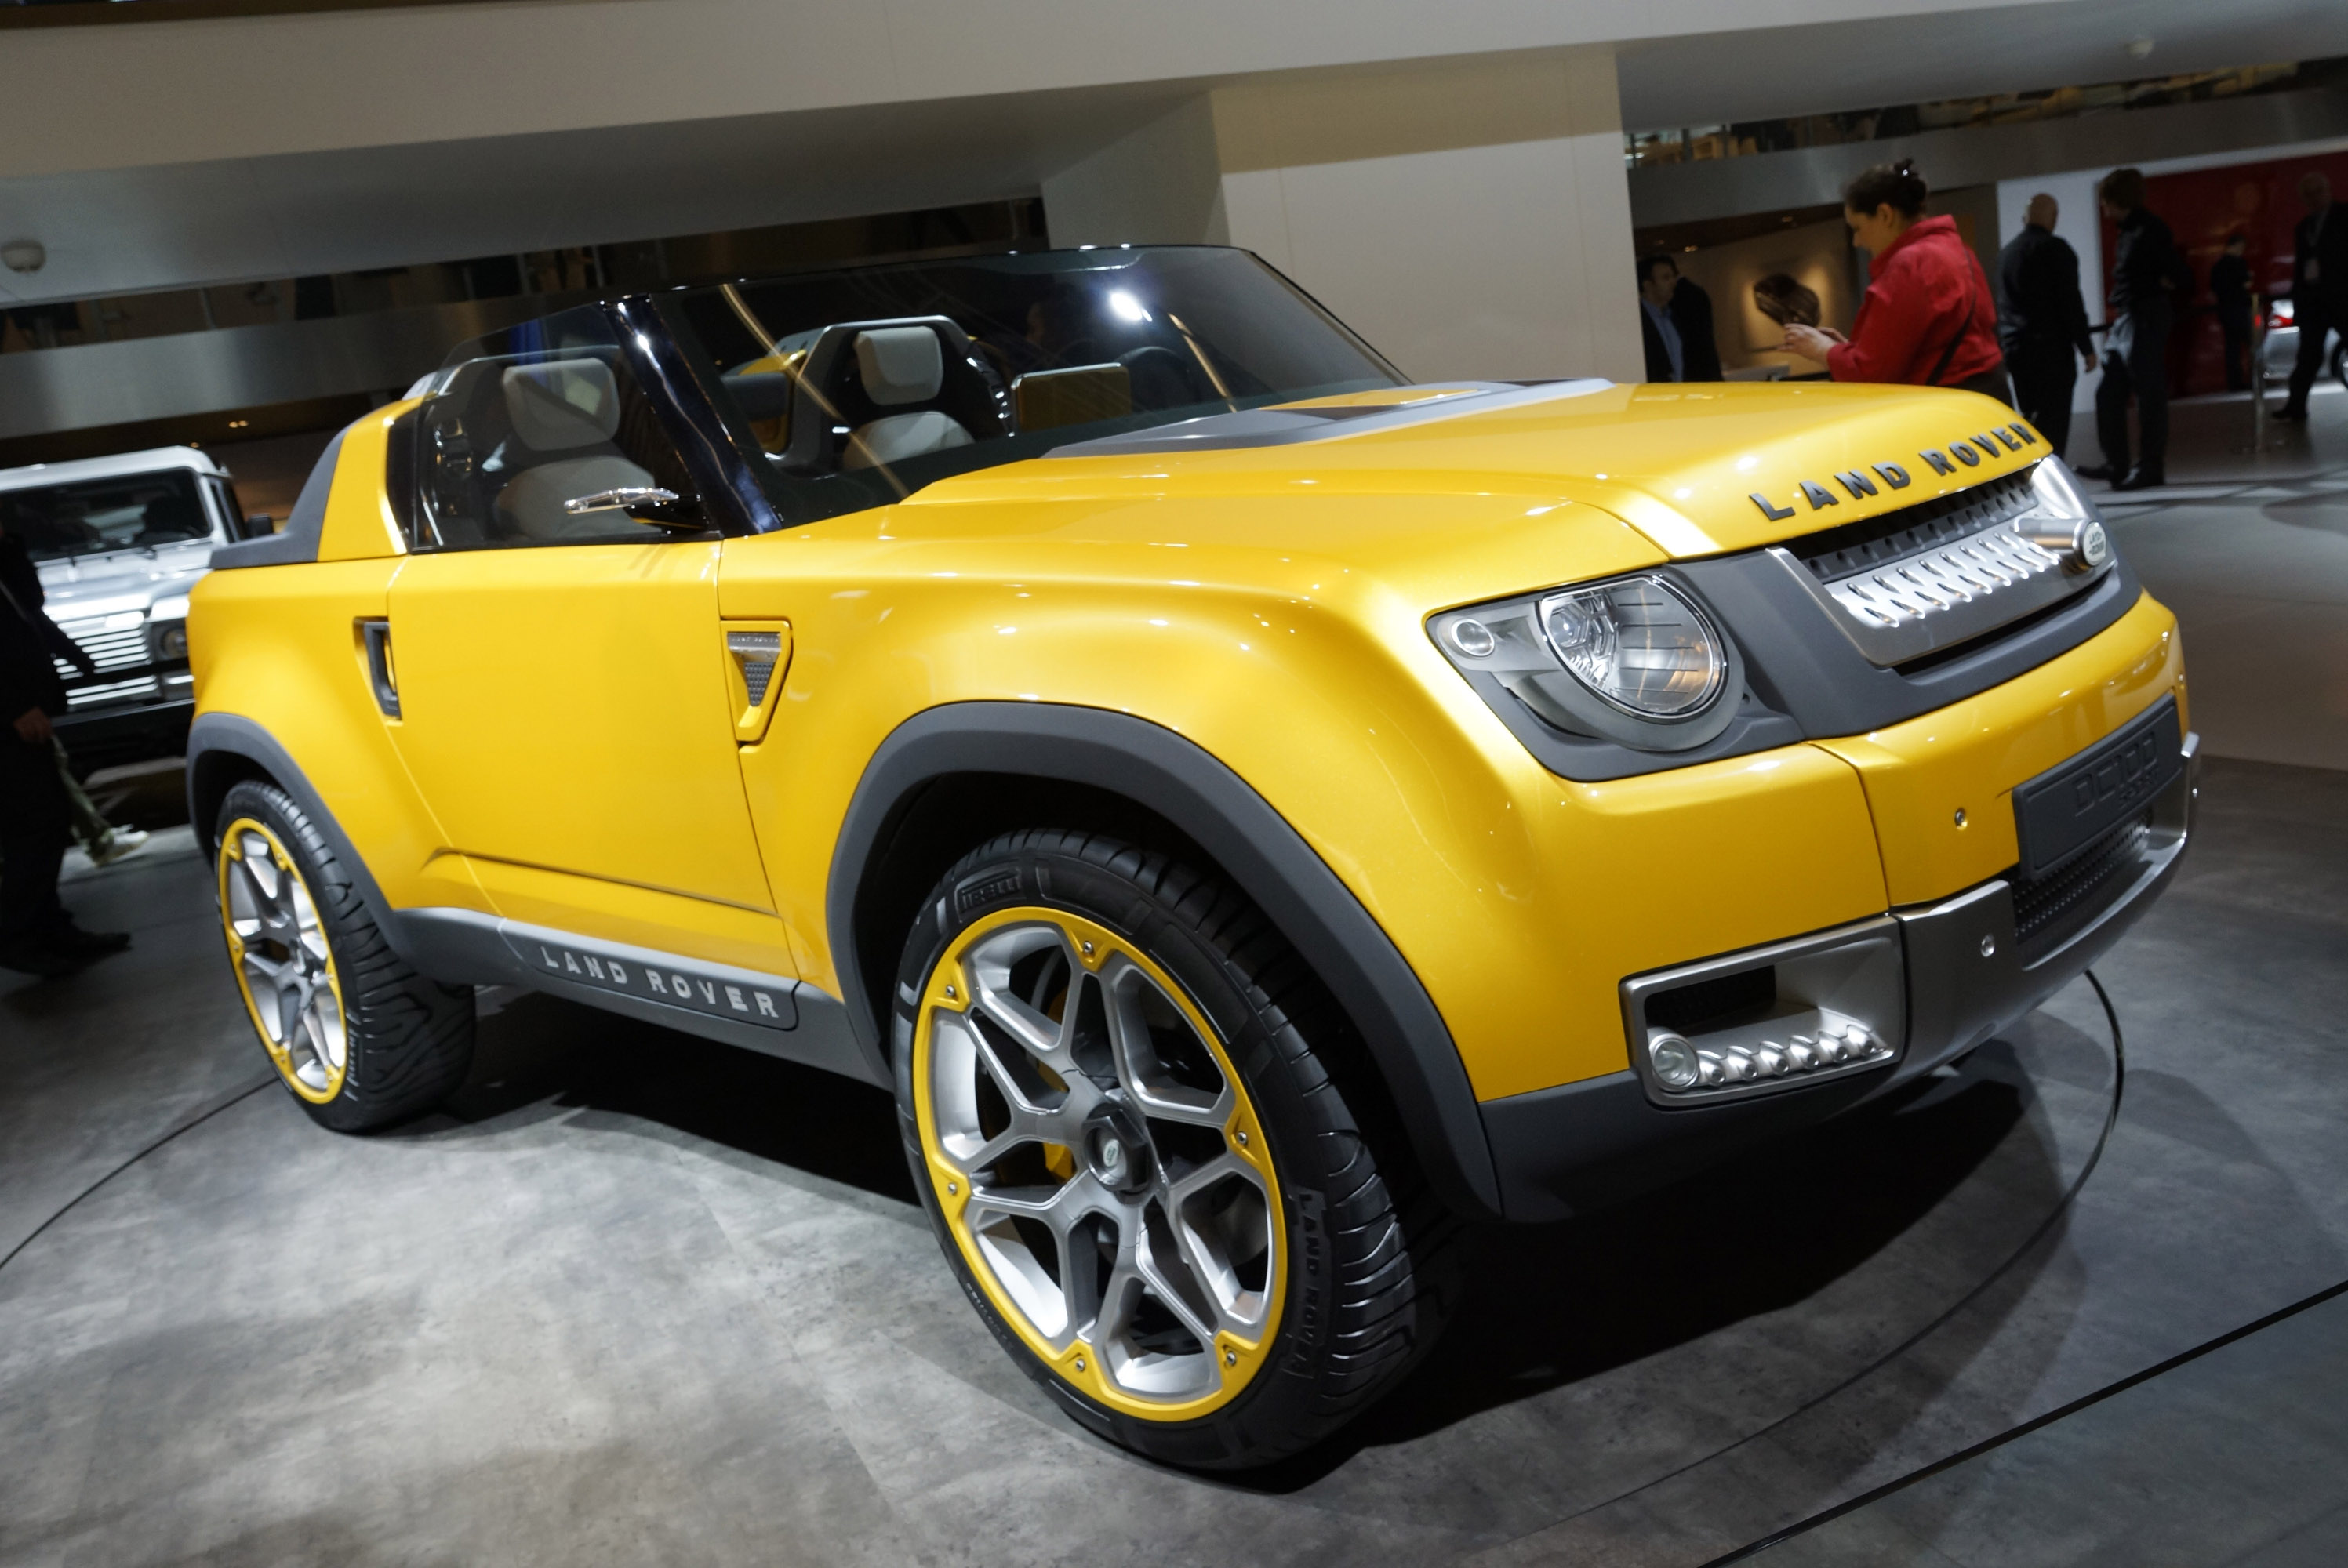 https://www.automobilesreview.com/gallery/land-rover-defender-dc100-sport-frankfurt-2011/land-rover-defender-dc100-sport-frankfurt-2011-02.jpg